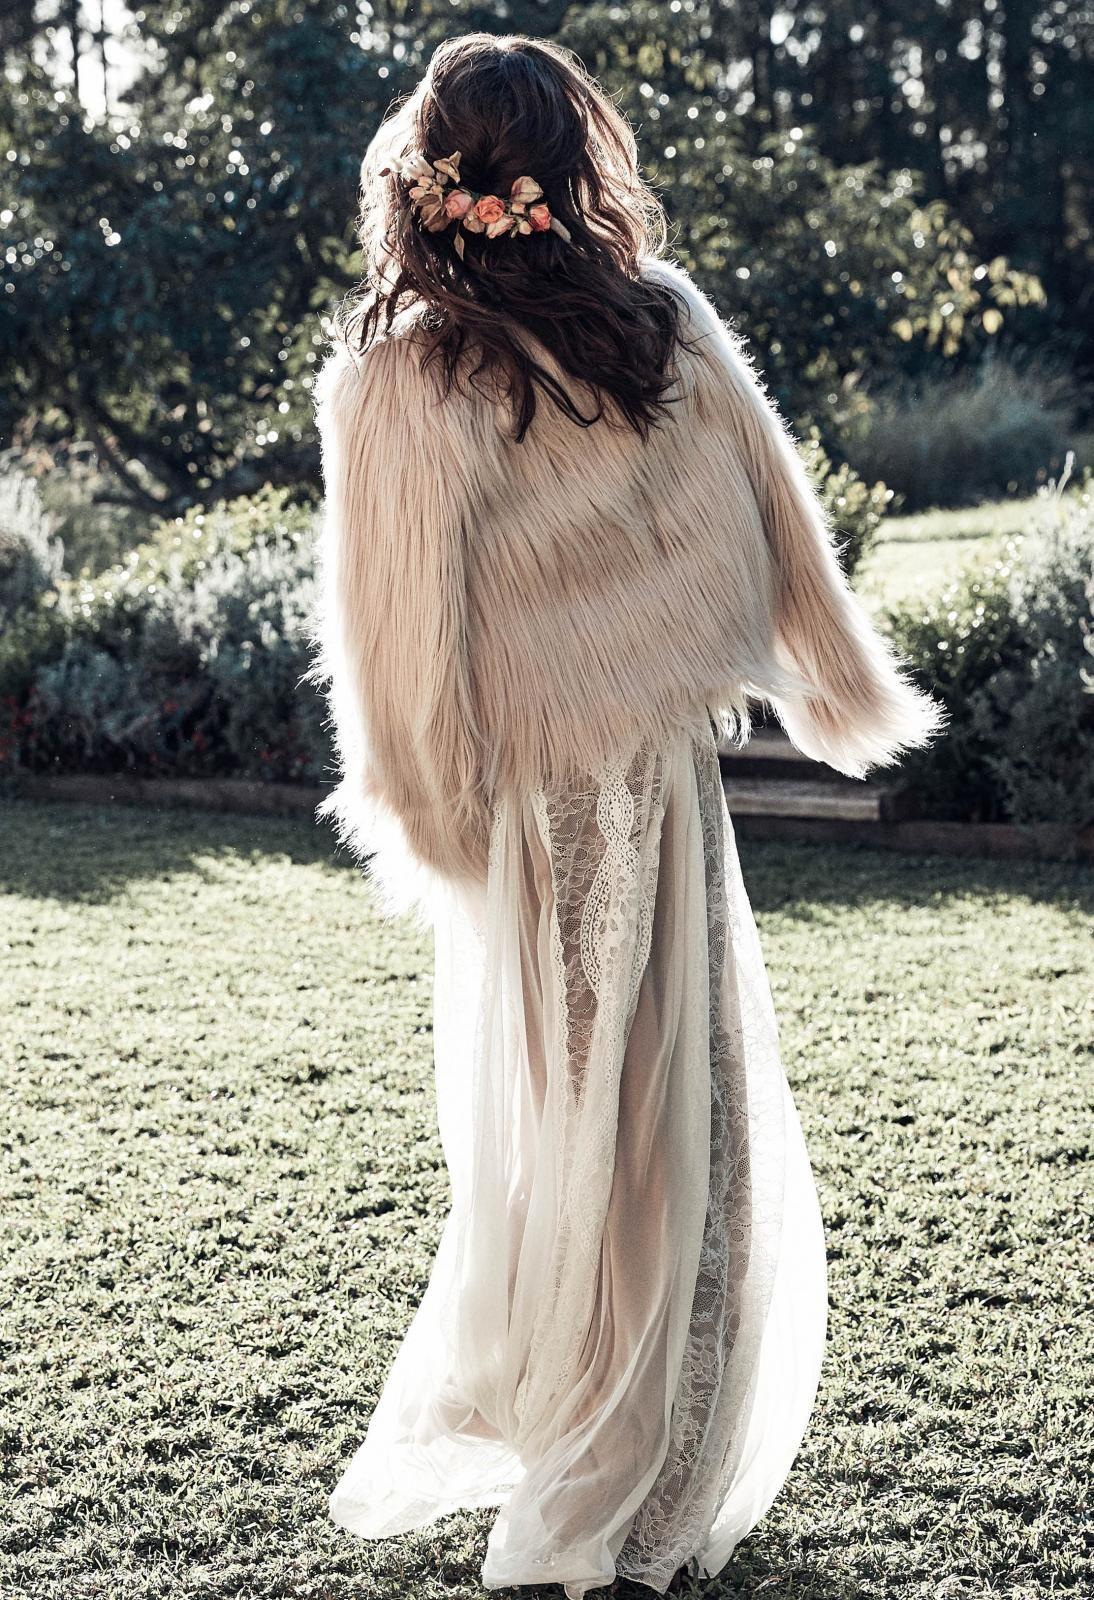 Fur wedding dress  Unreal Dream Faux Fur Jacket  Pinterest  Fur jacket Lace wedding